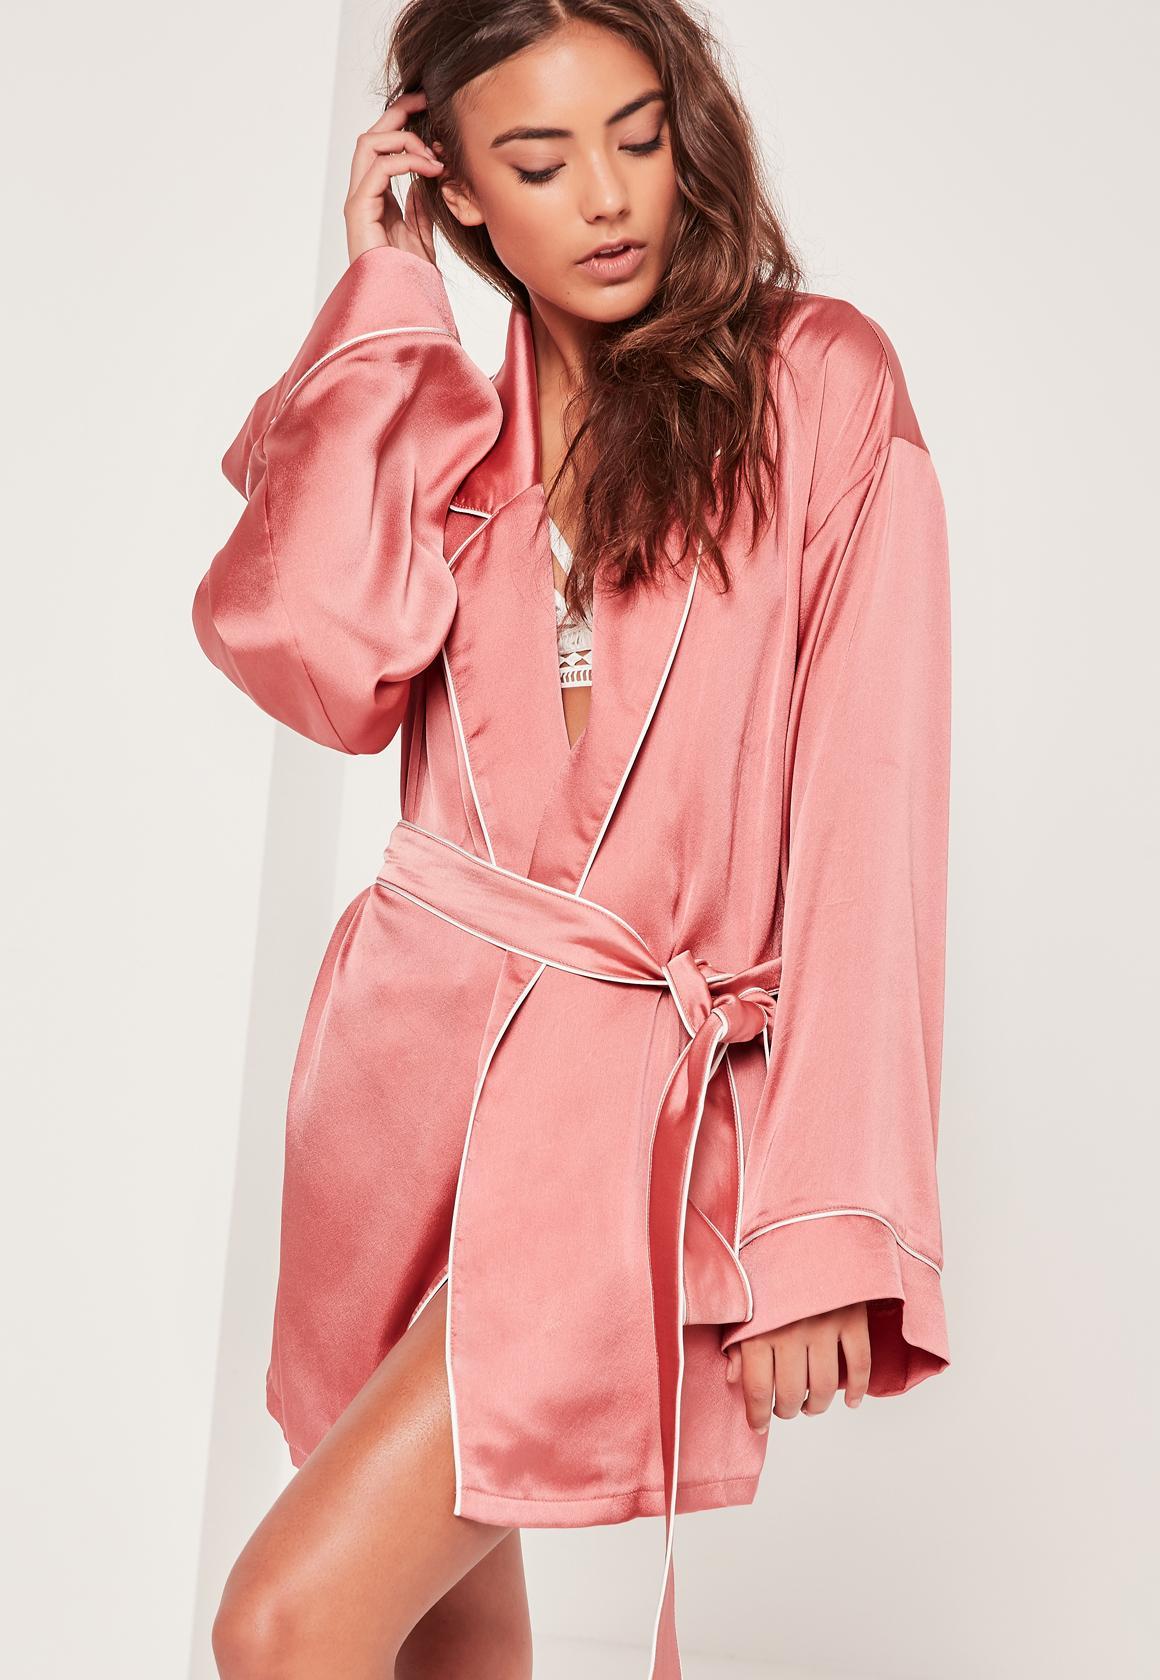 pink kimono piped detail silk robe rlpfyfz